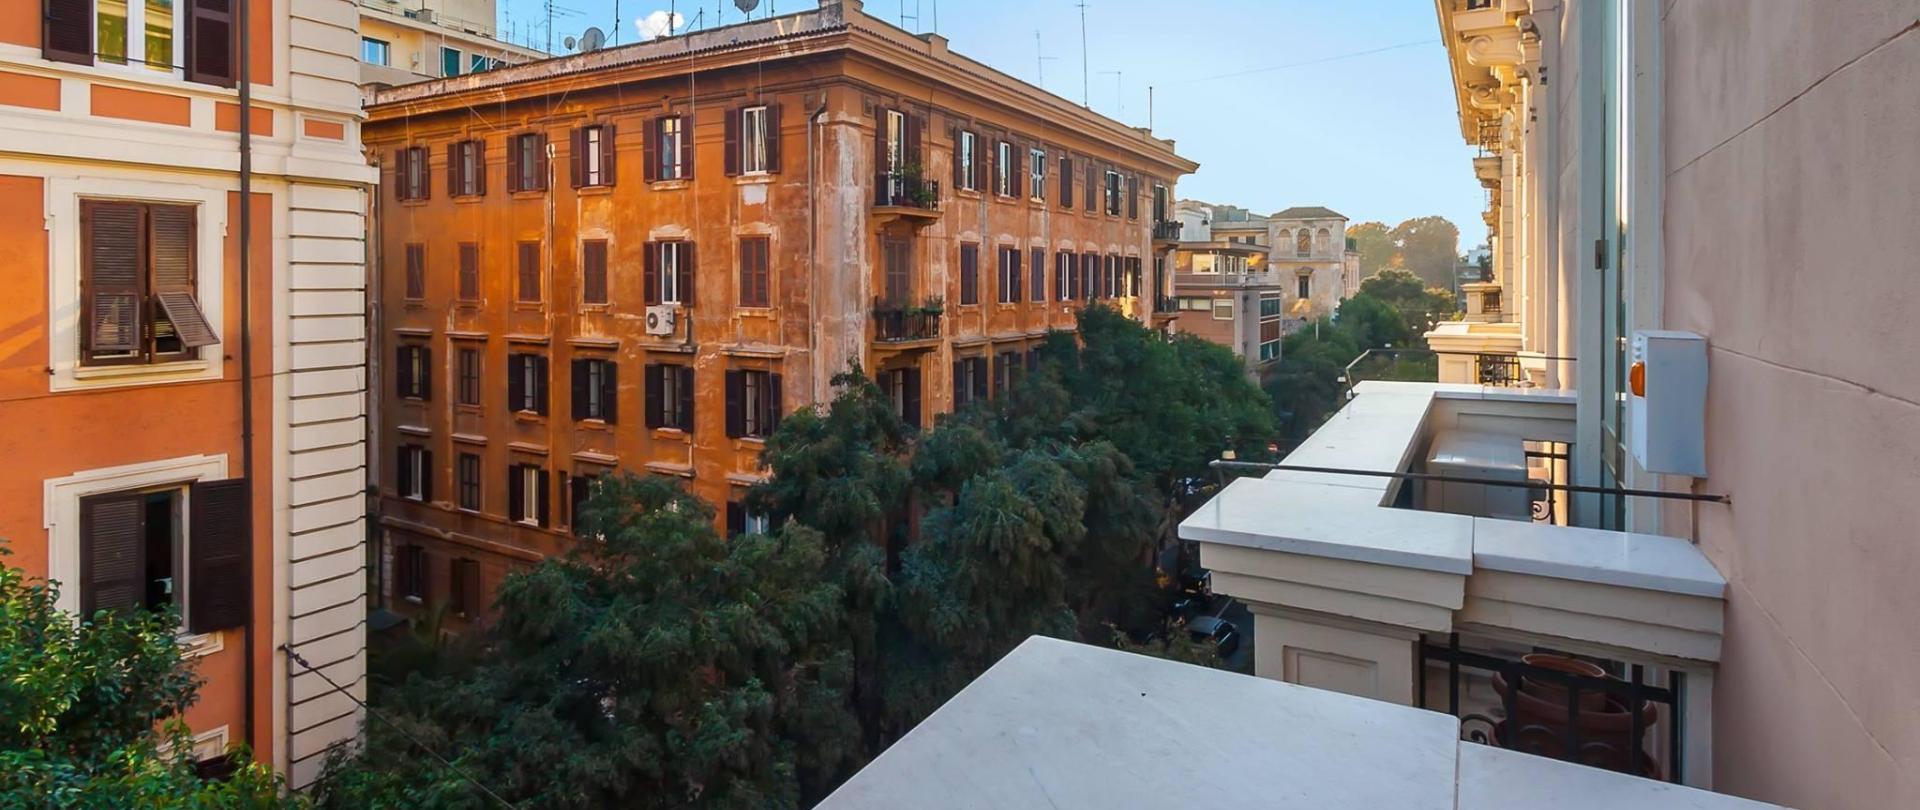 Residencia romana